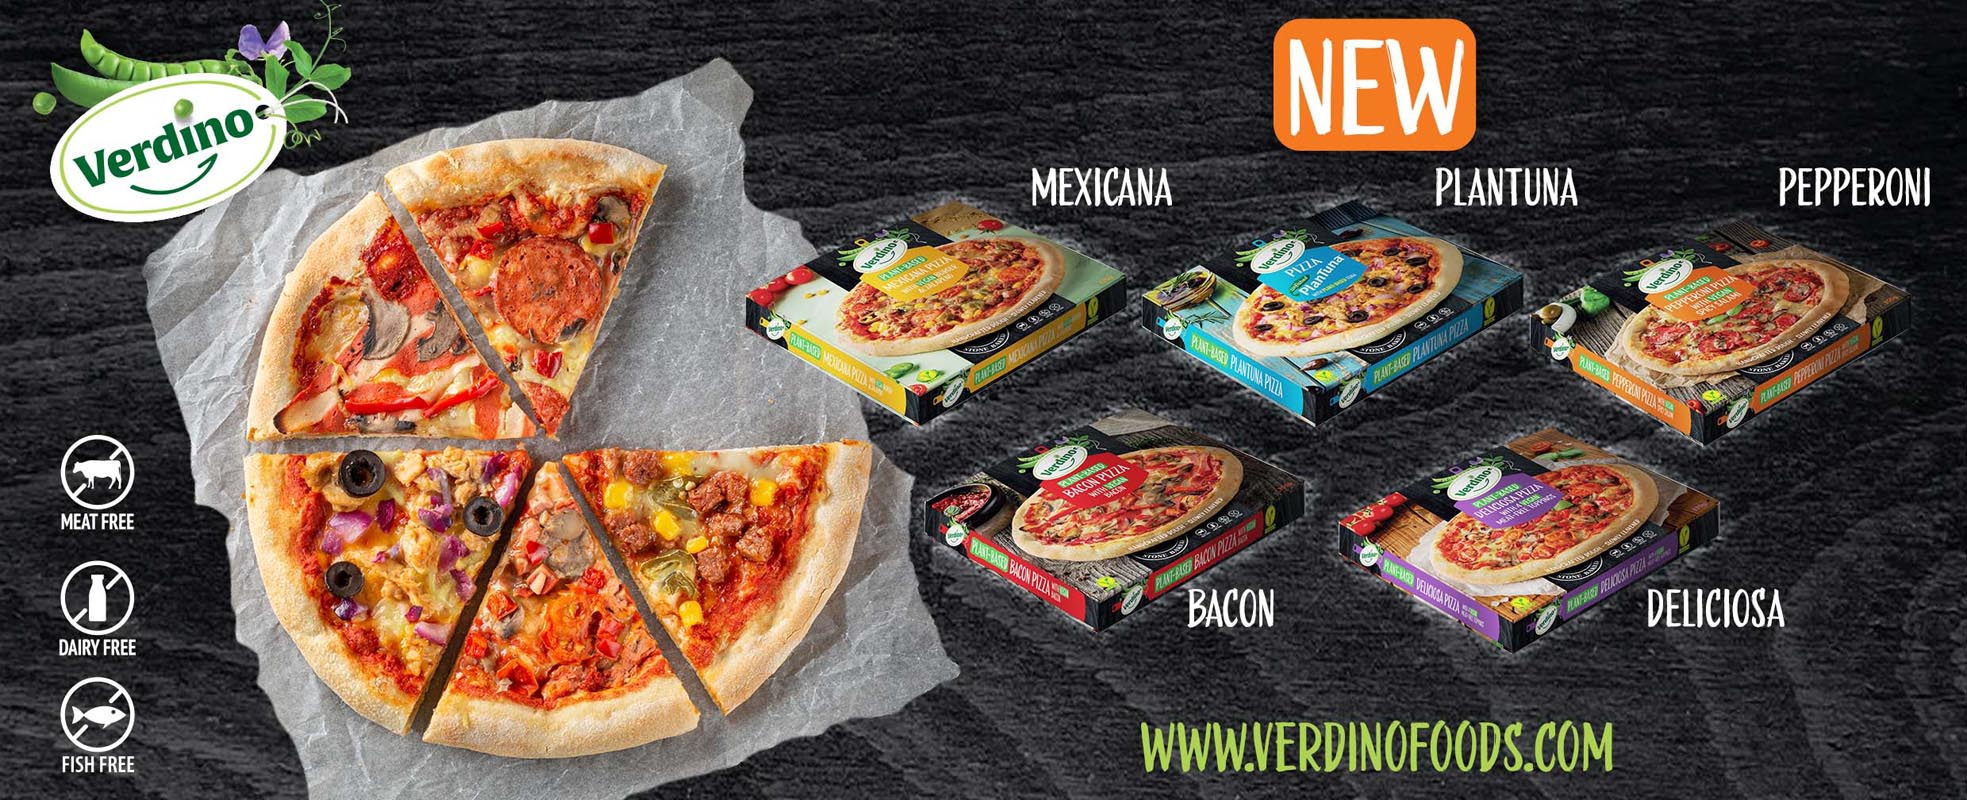 Verdino-pizza plant-based